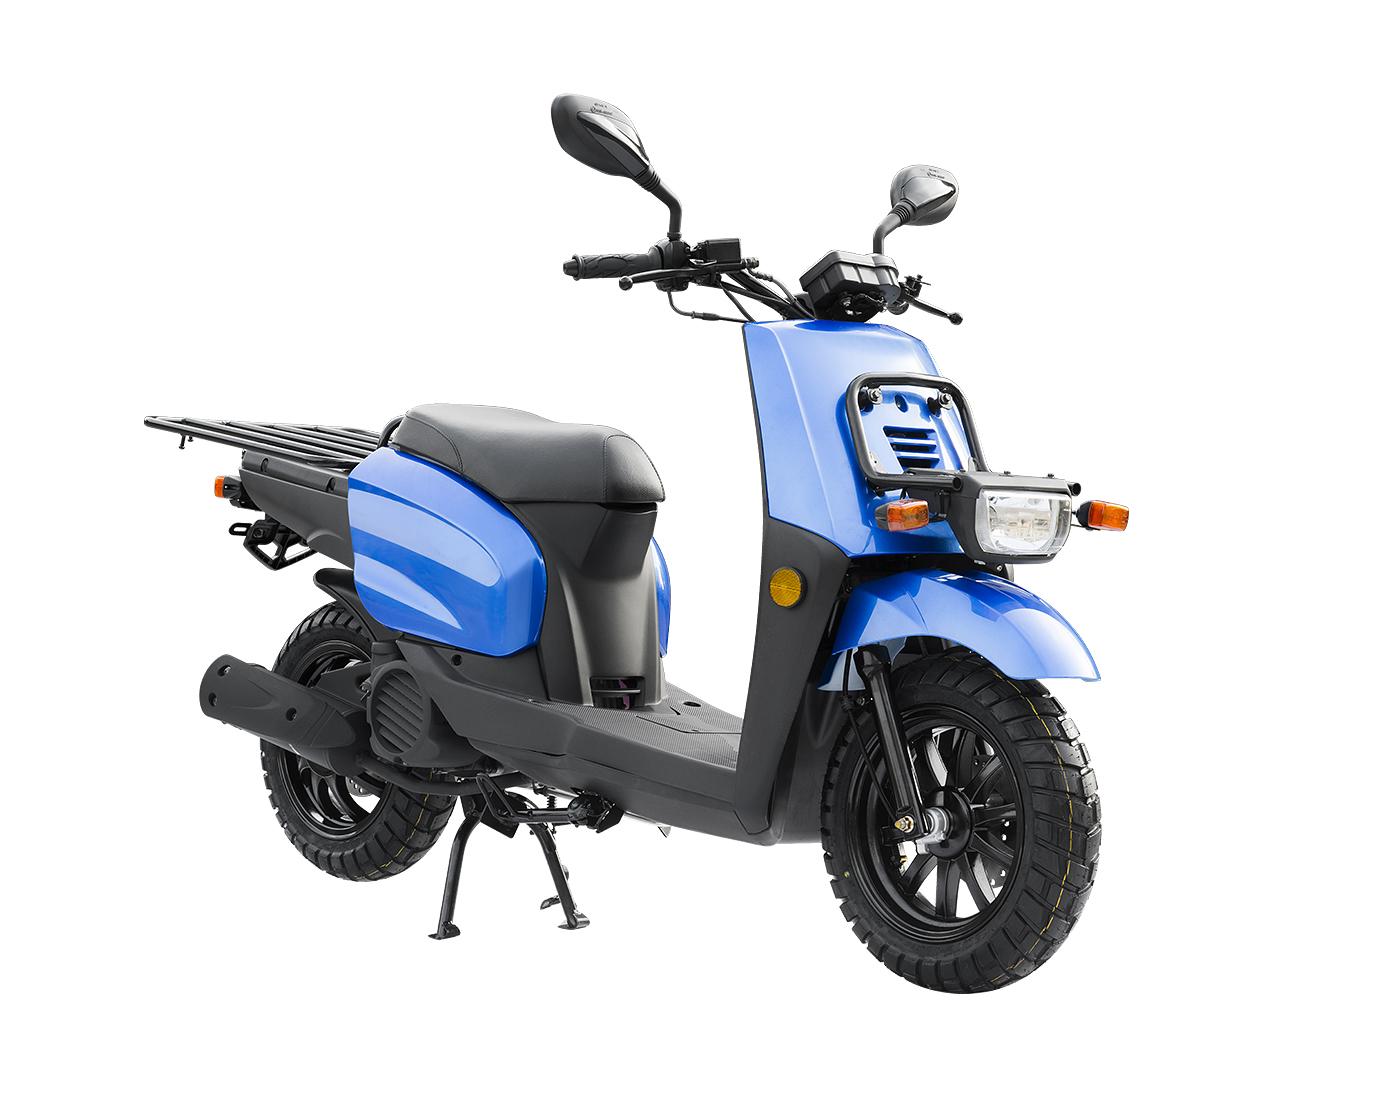 MotoRR Delivery 50cc